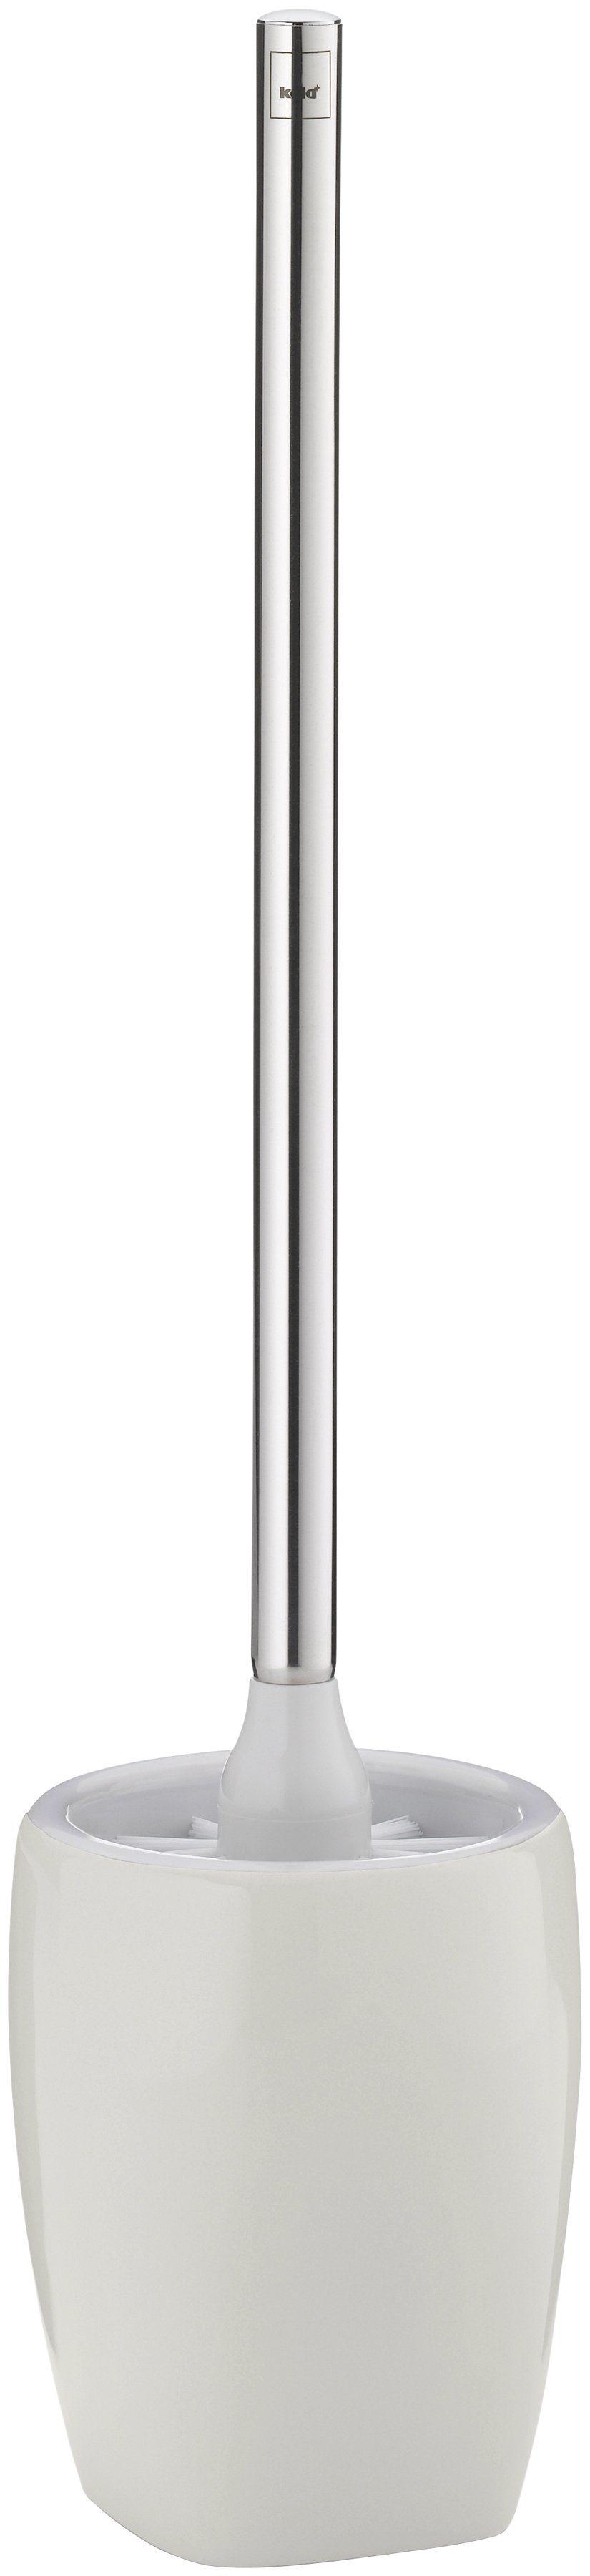 KELA WC-Garnitur »Lindano«, Keramik, Höhe 45 cm, Ø 12 cm